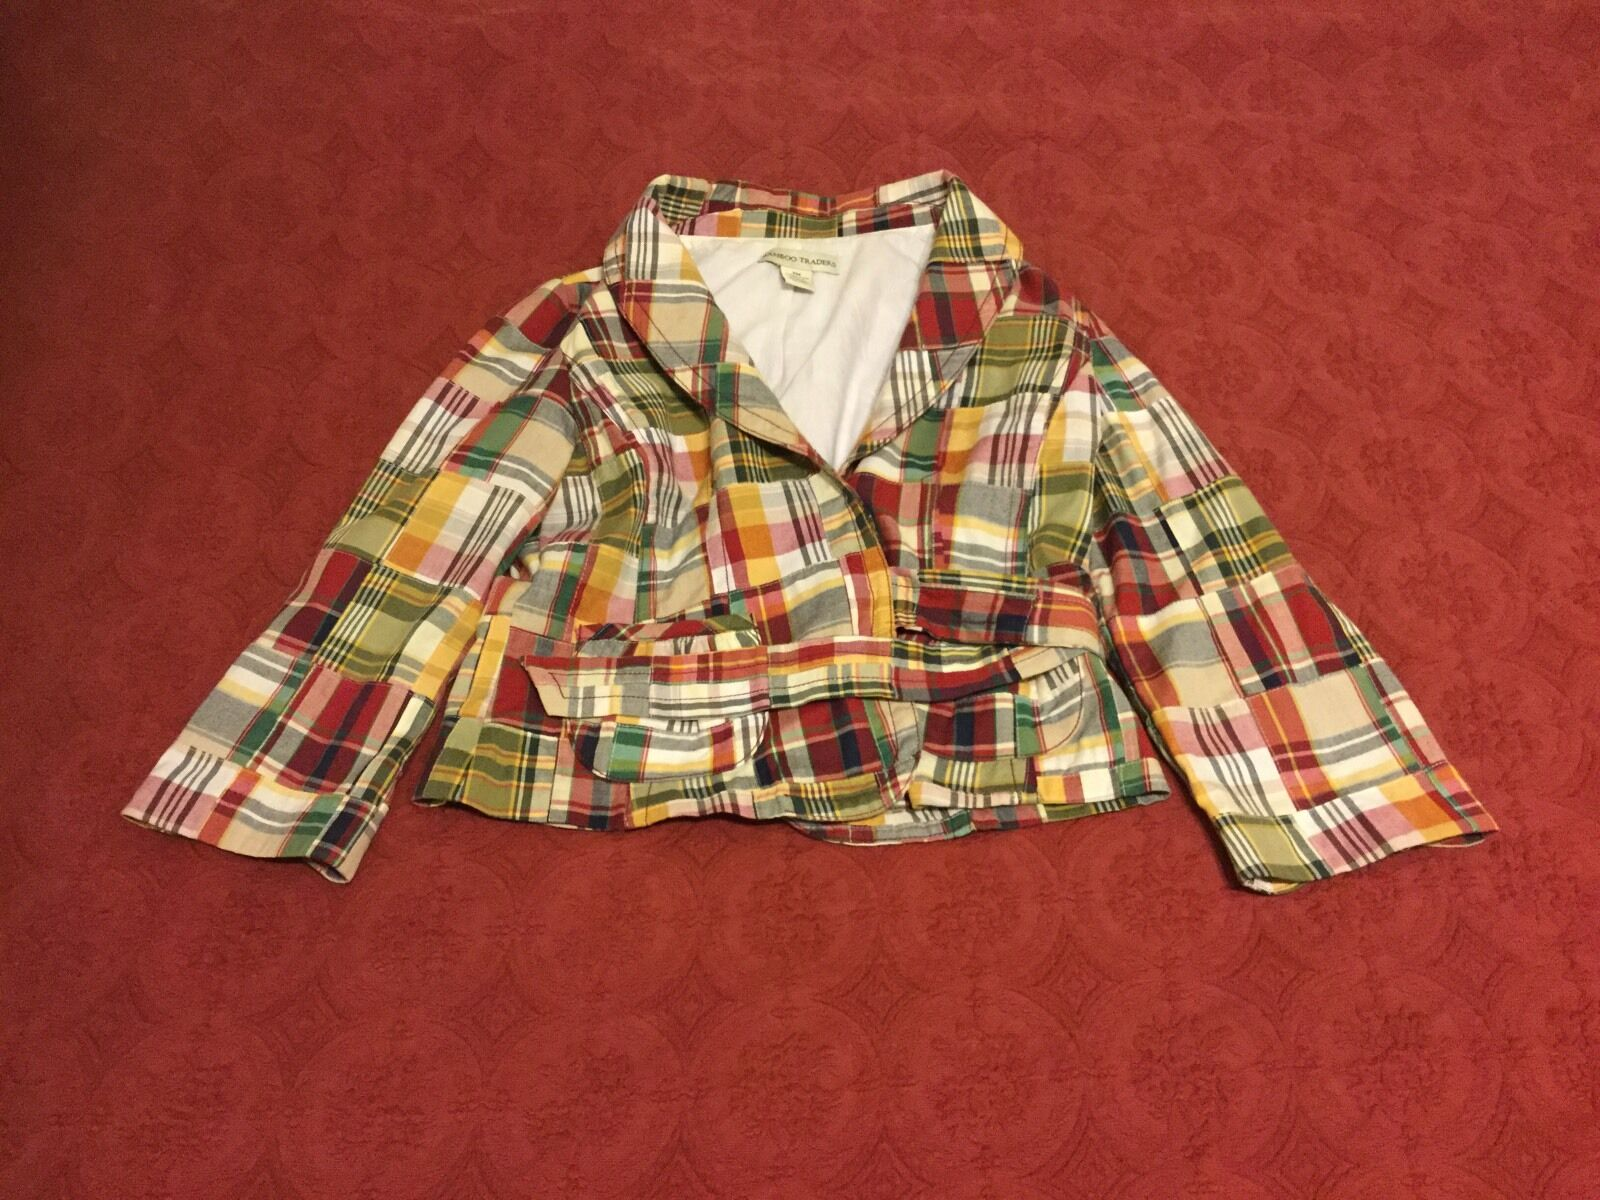 NWOT Bamboo Traders Sz M Pet Madras Multi-Colored Plaid Short Coat w/ Waist Ties